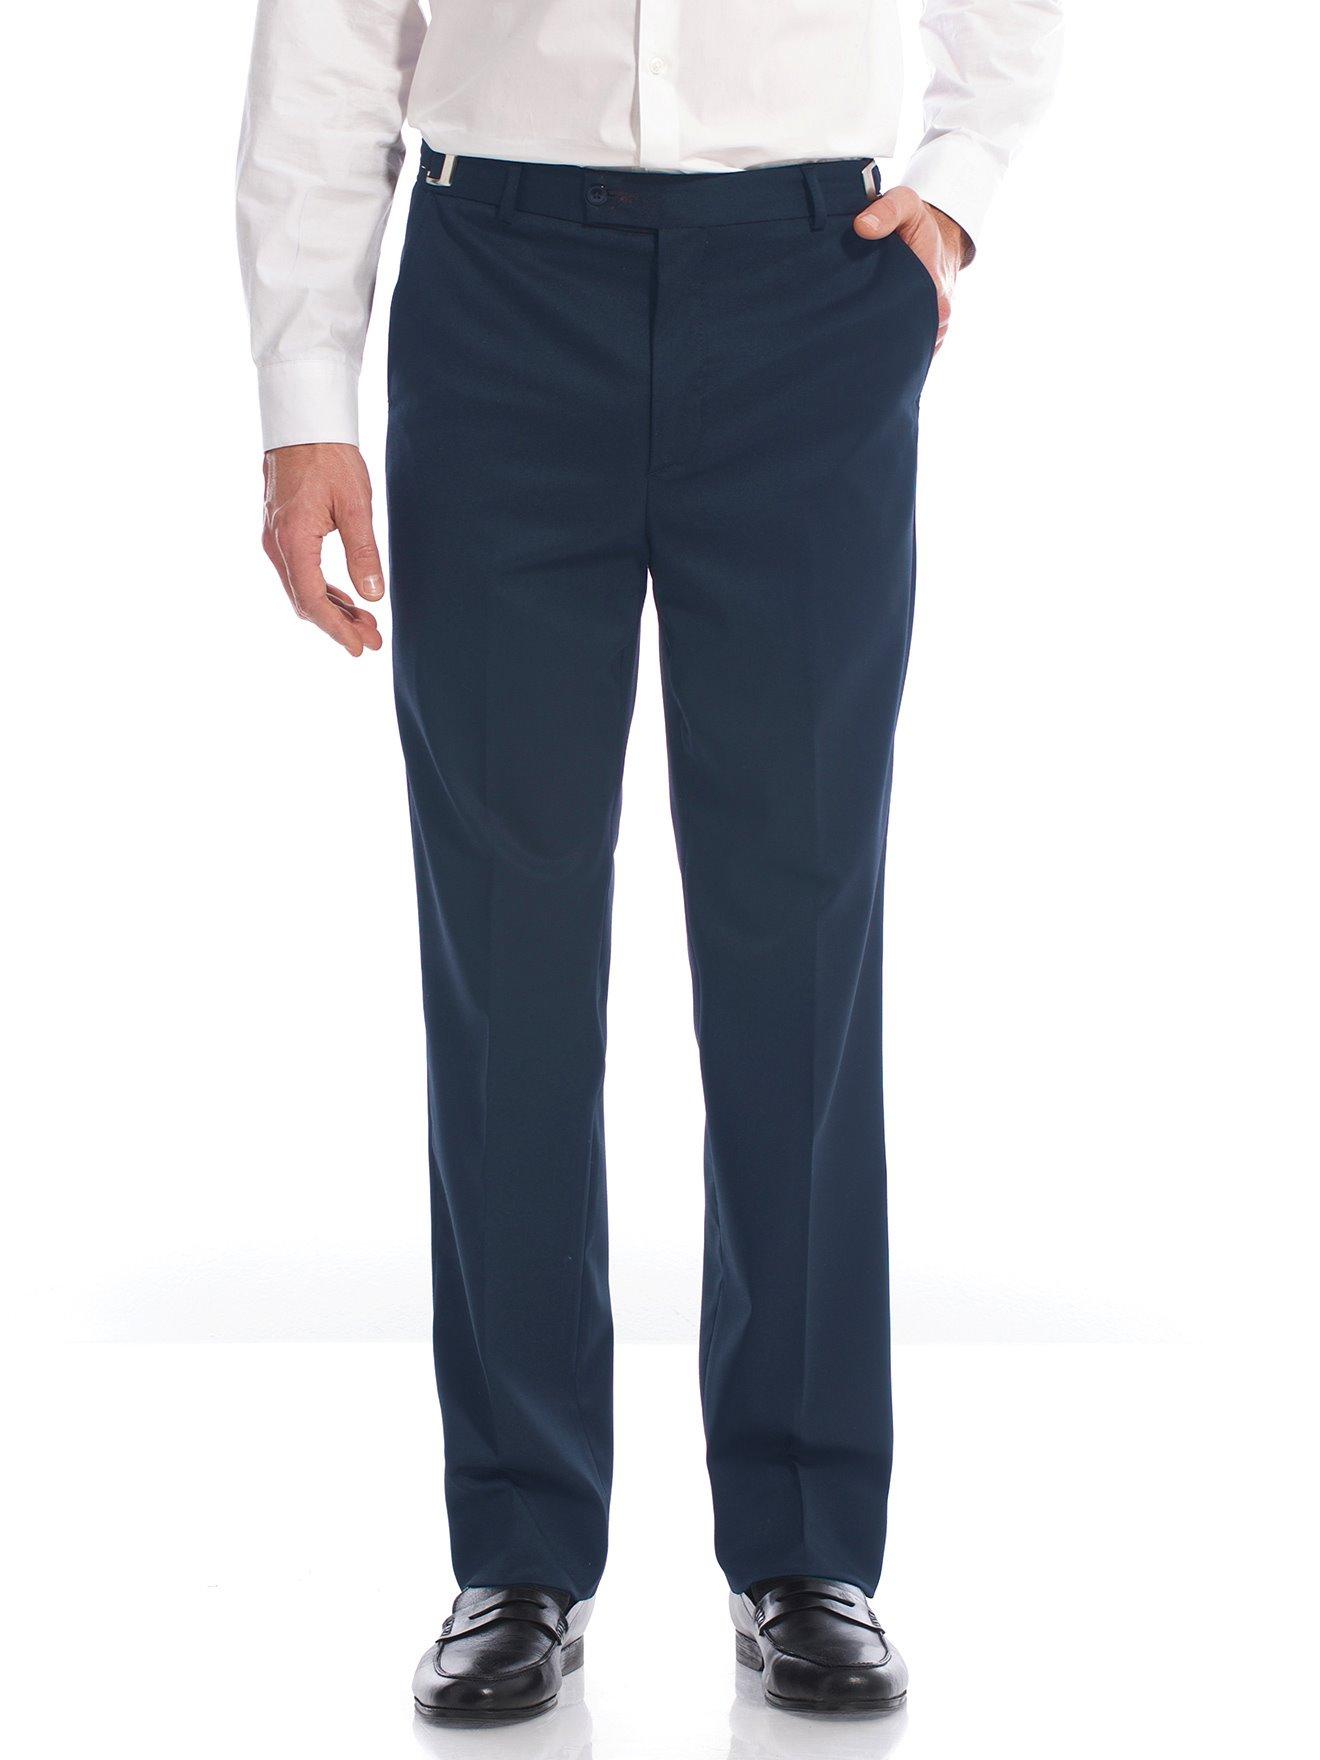 440438b2cfdd Pantalon à ceinture réglable - Daxon